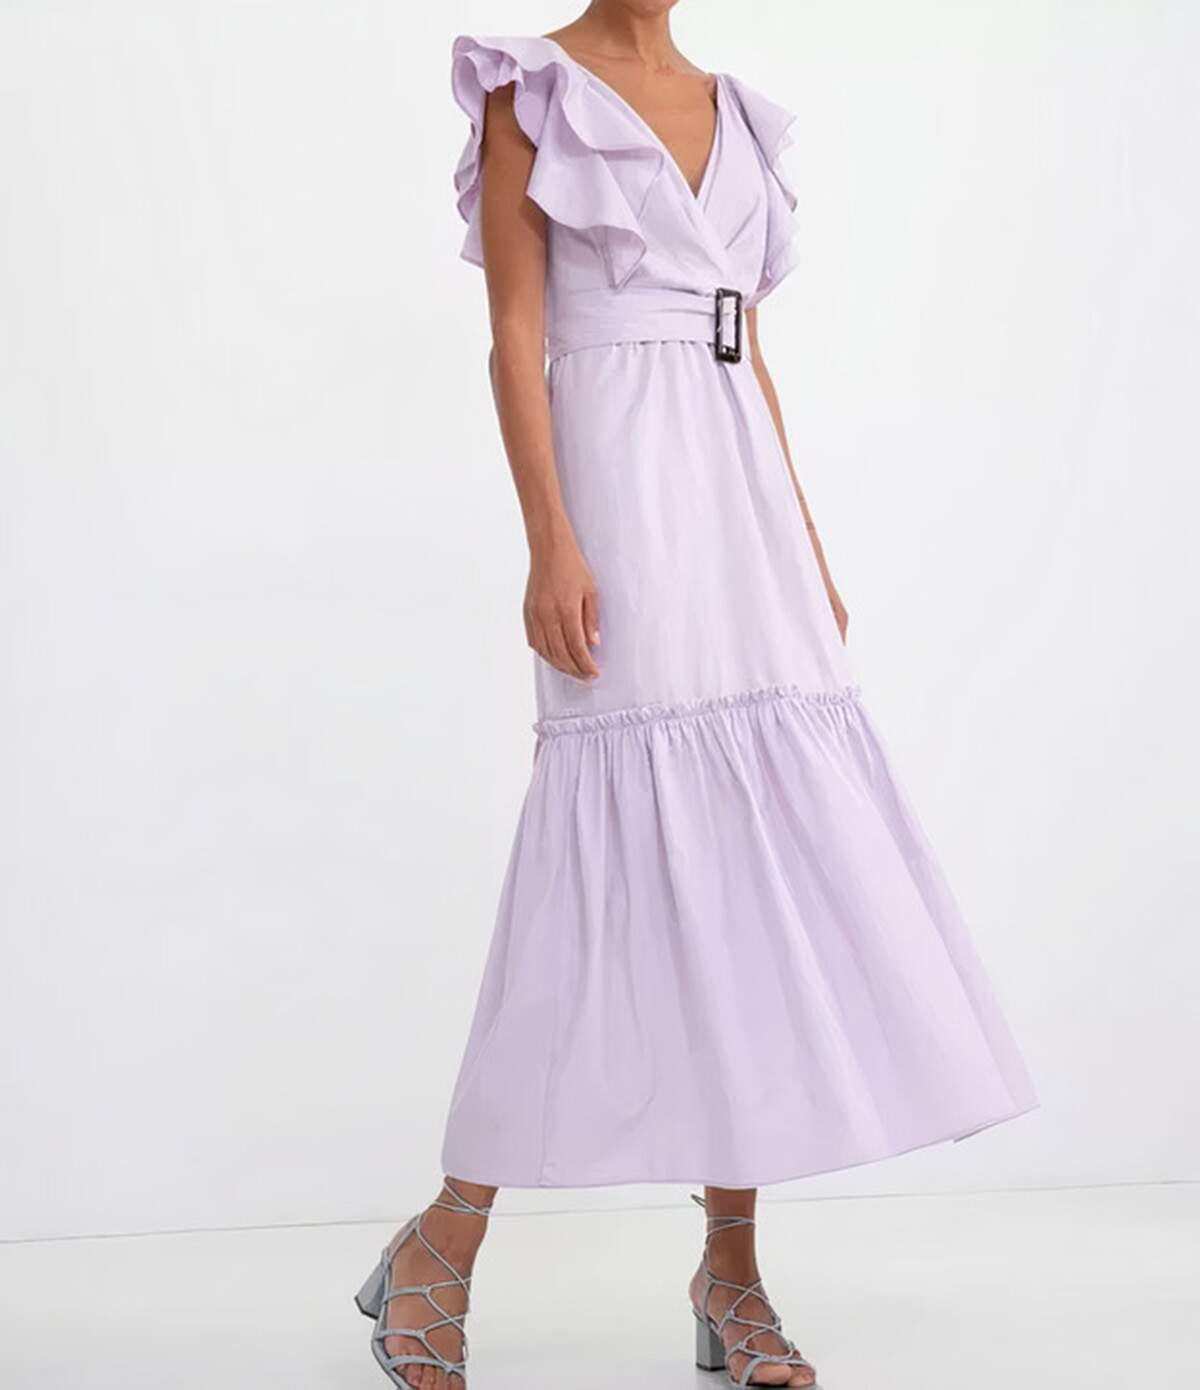 Tendência breezy dress